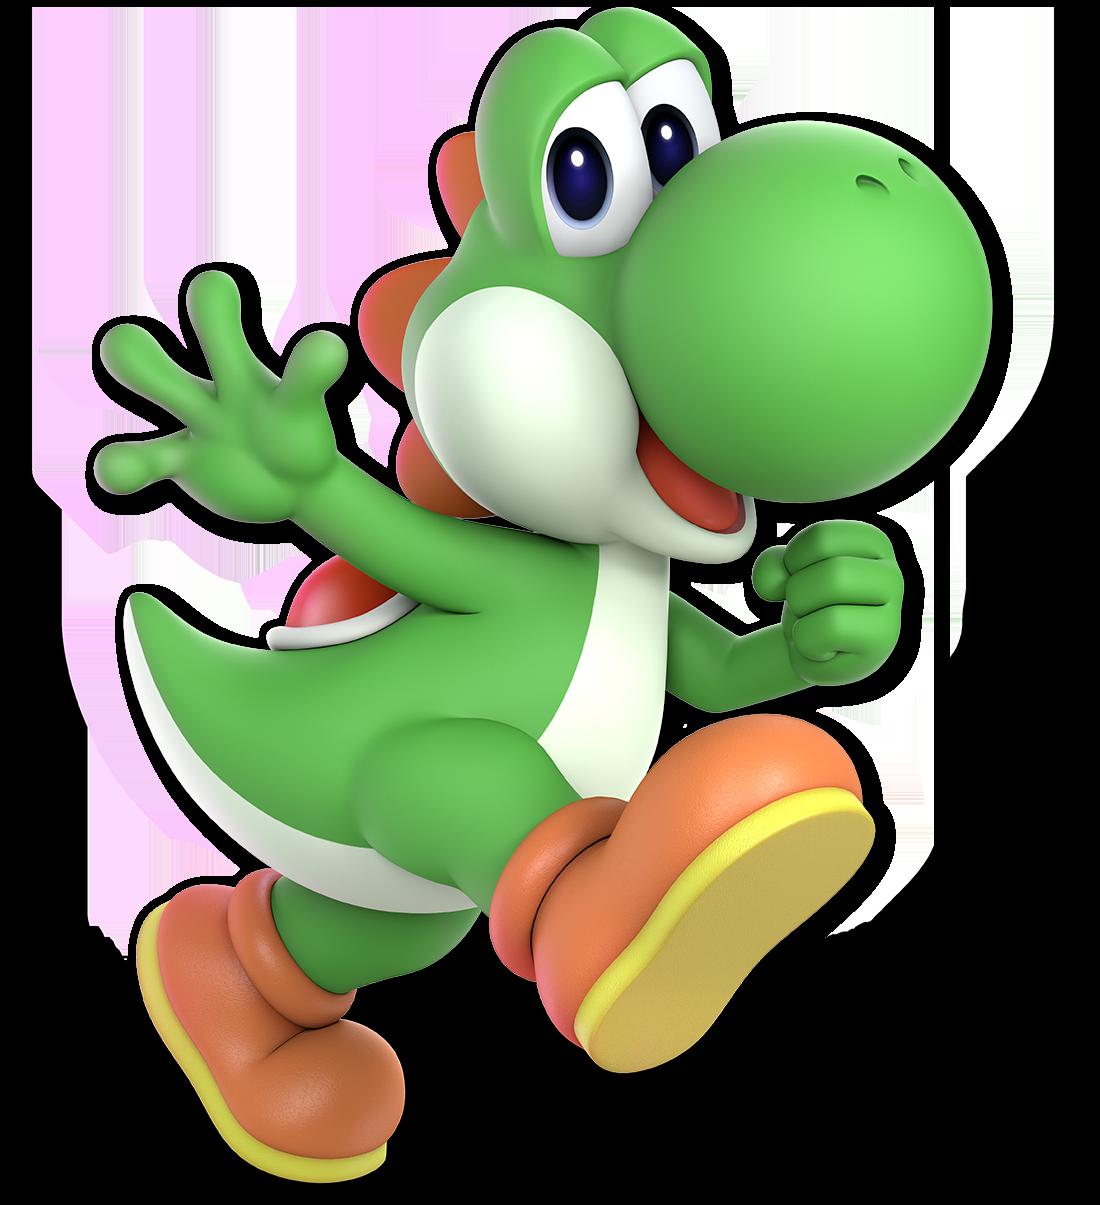 Yoshi In Super Smash Bros Ultimate Super Smash Brothers Ultimate Super Smash Bros Super Smash Brothers Yoshi